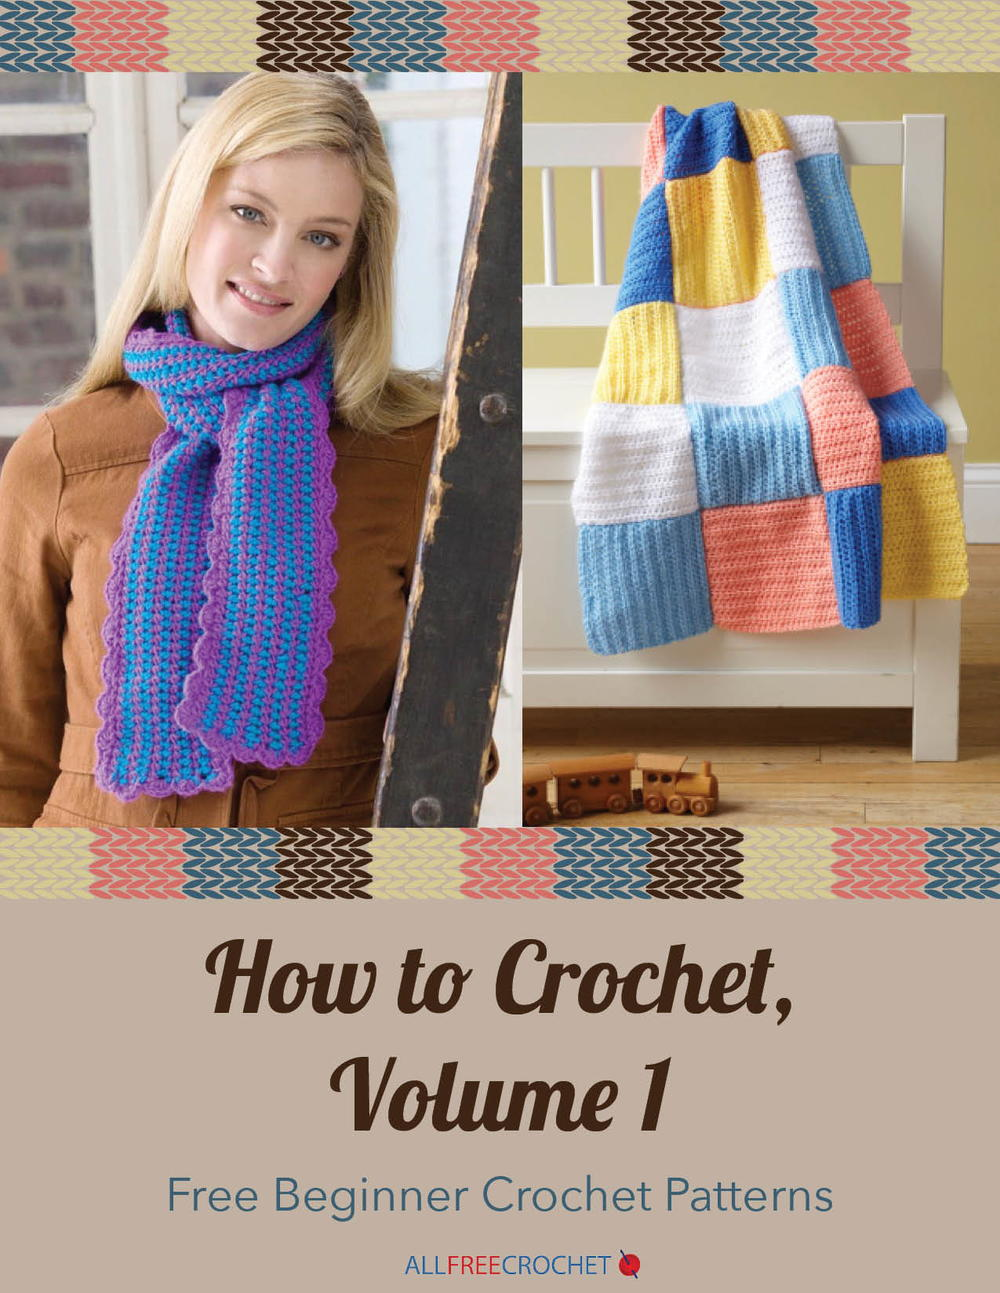 How to read crochet patterns allfreecrochet how to crochet volume 1 free beginner crochet patterns bankloansurffo Images